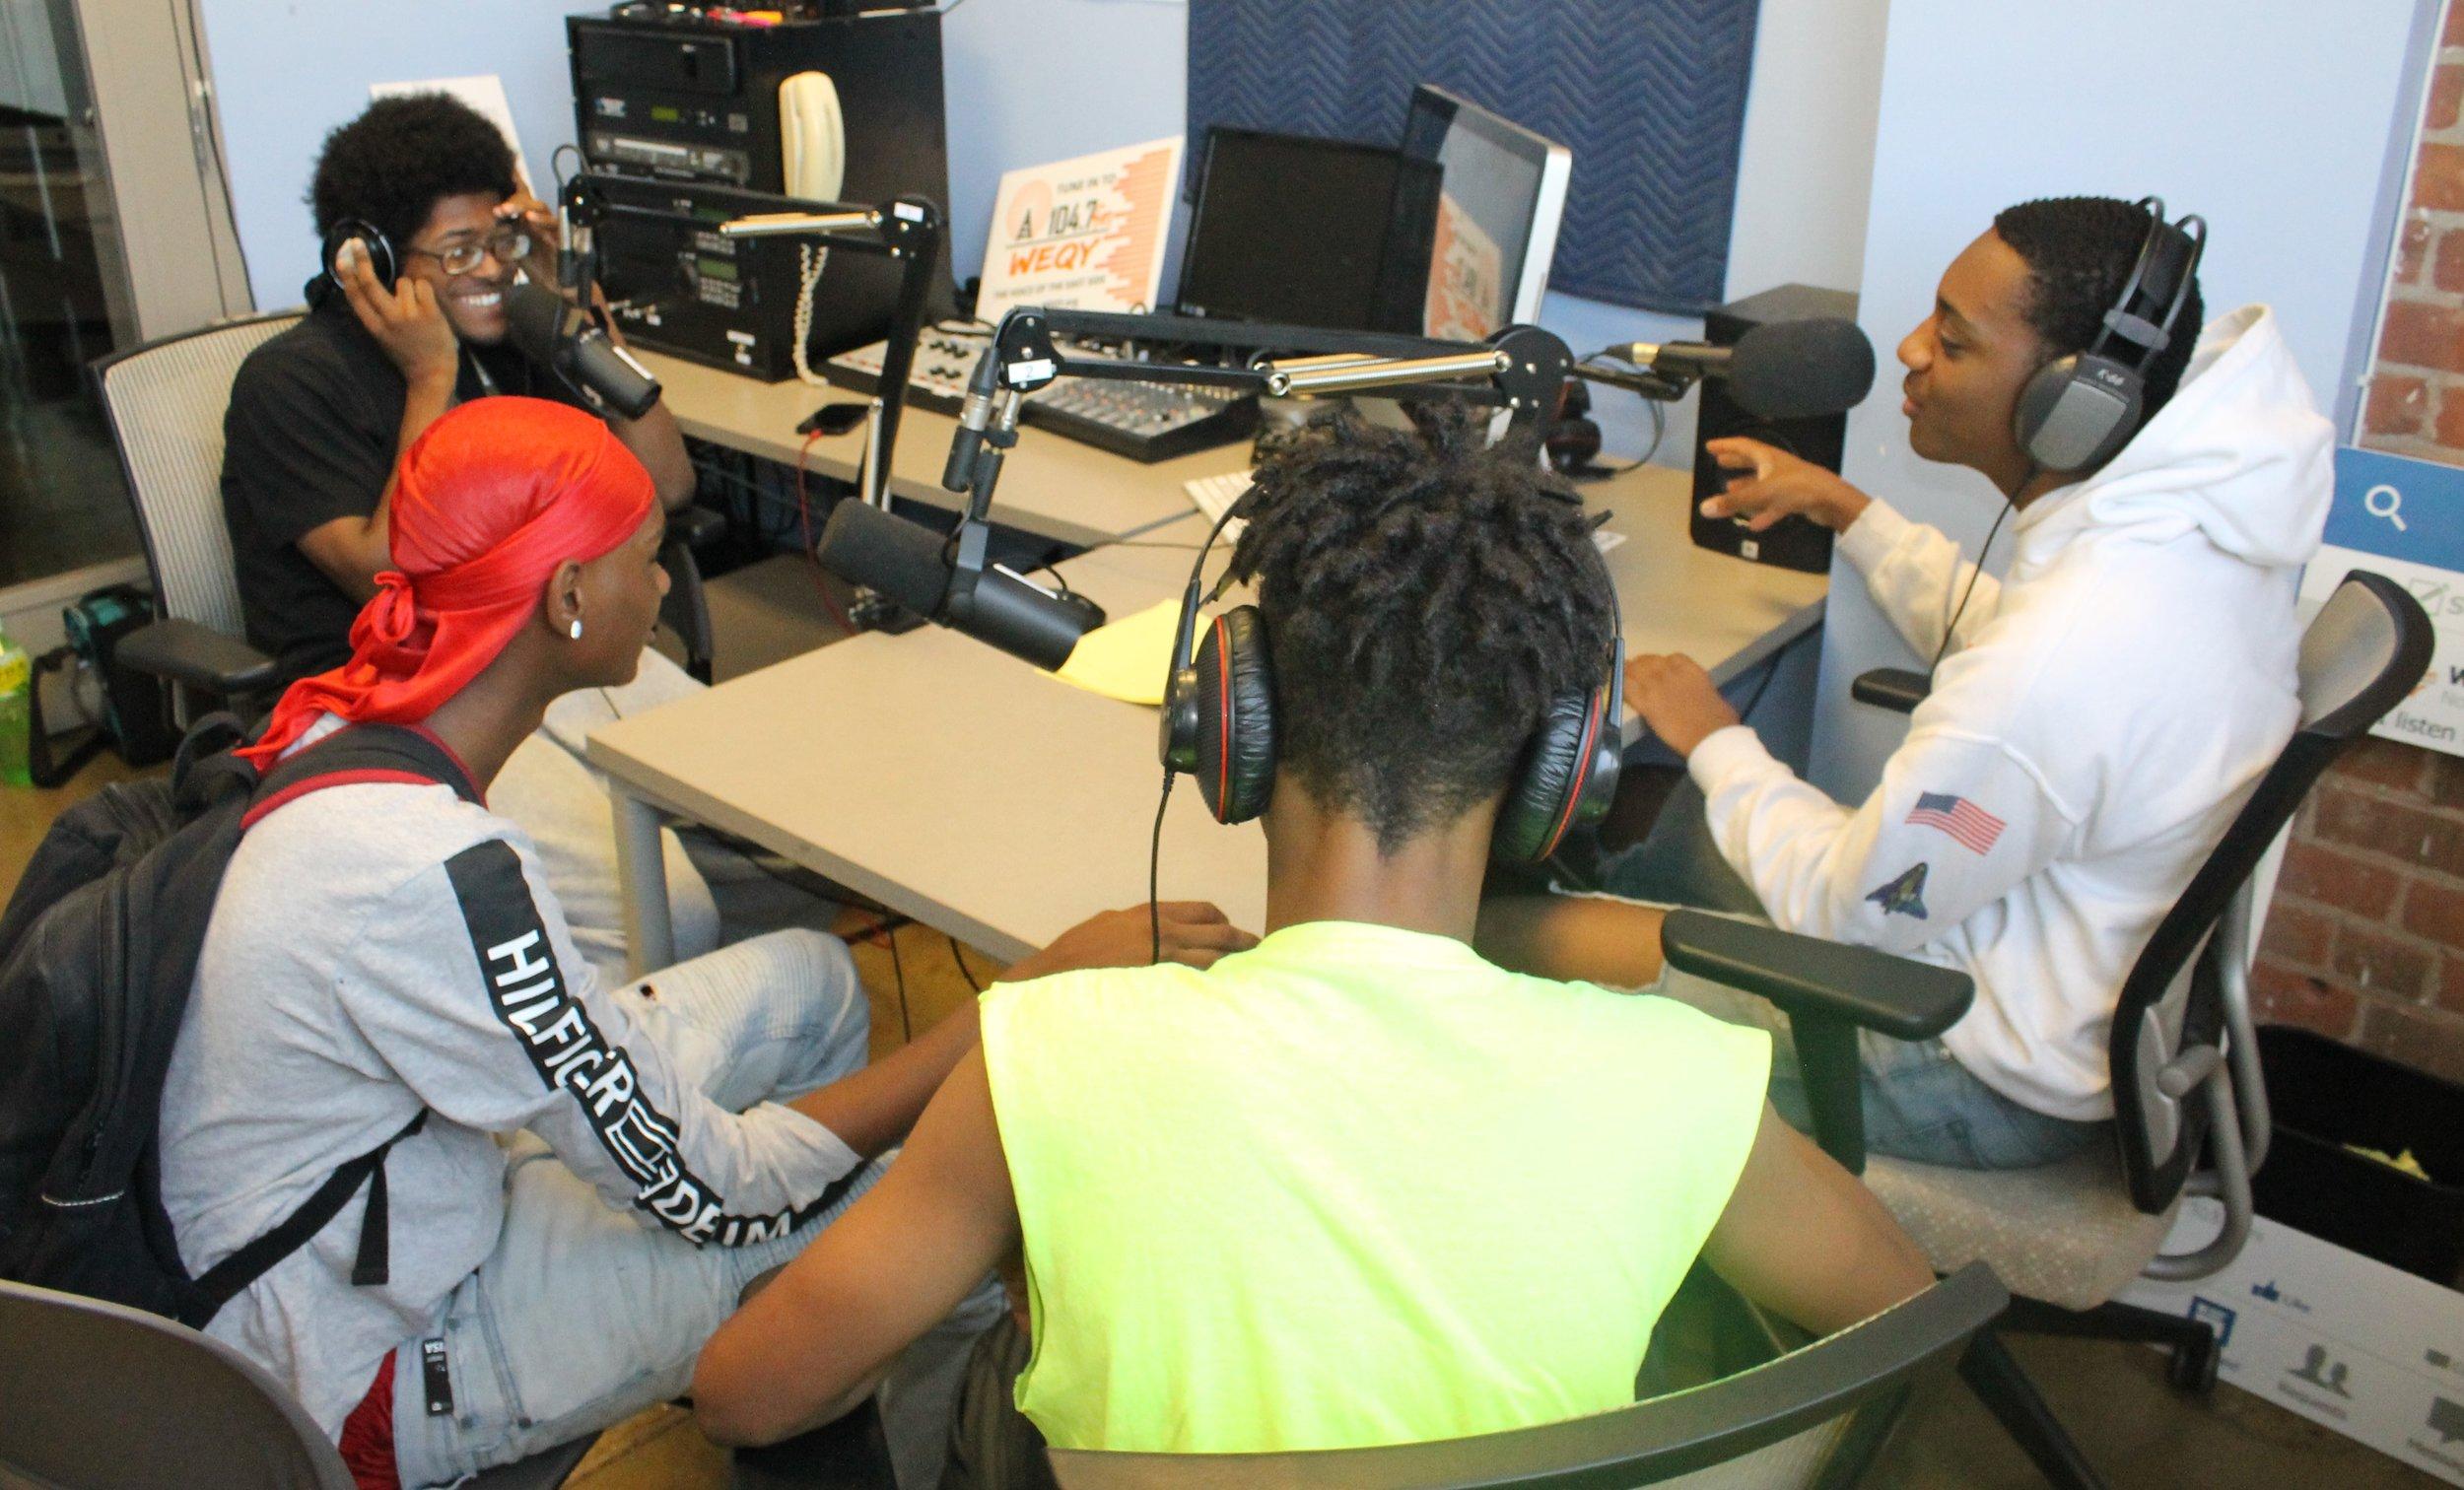 New Lens Urban Mentoring Society #NewLensSociety George Washington Carver Experience (1).JPG